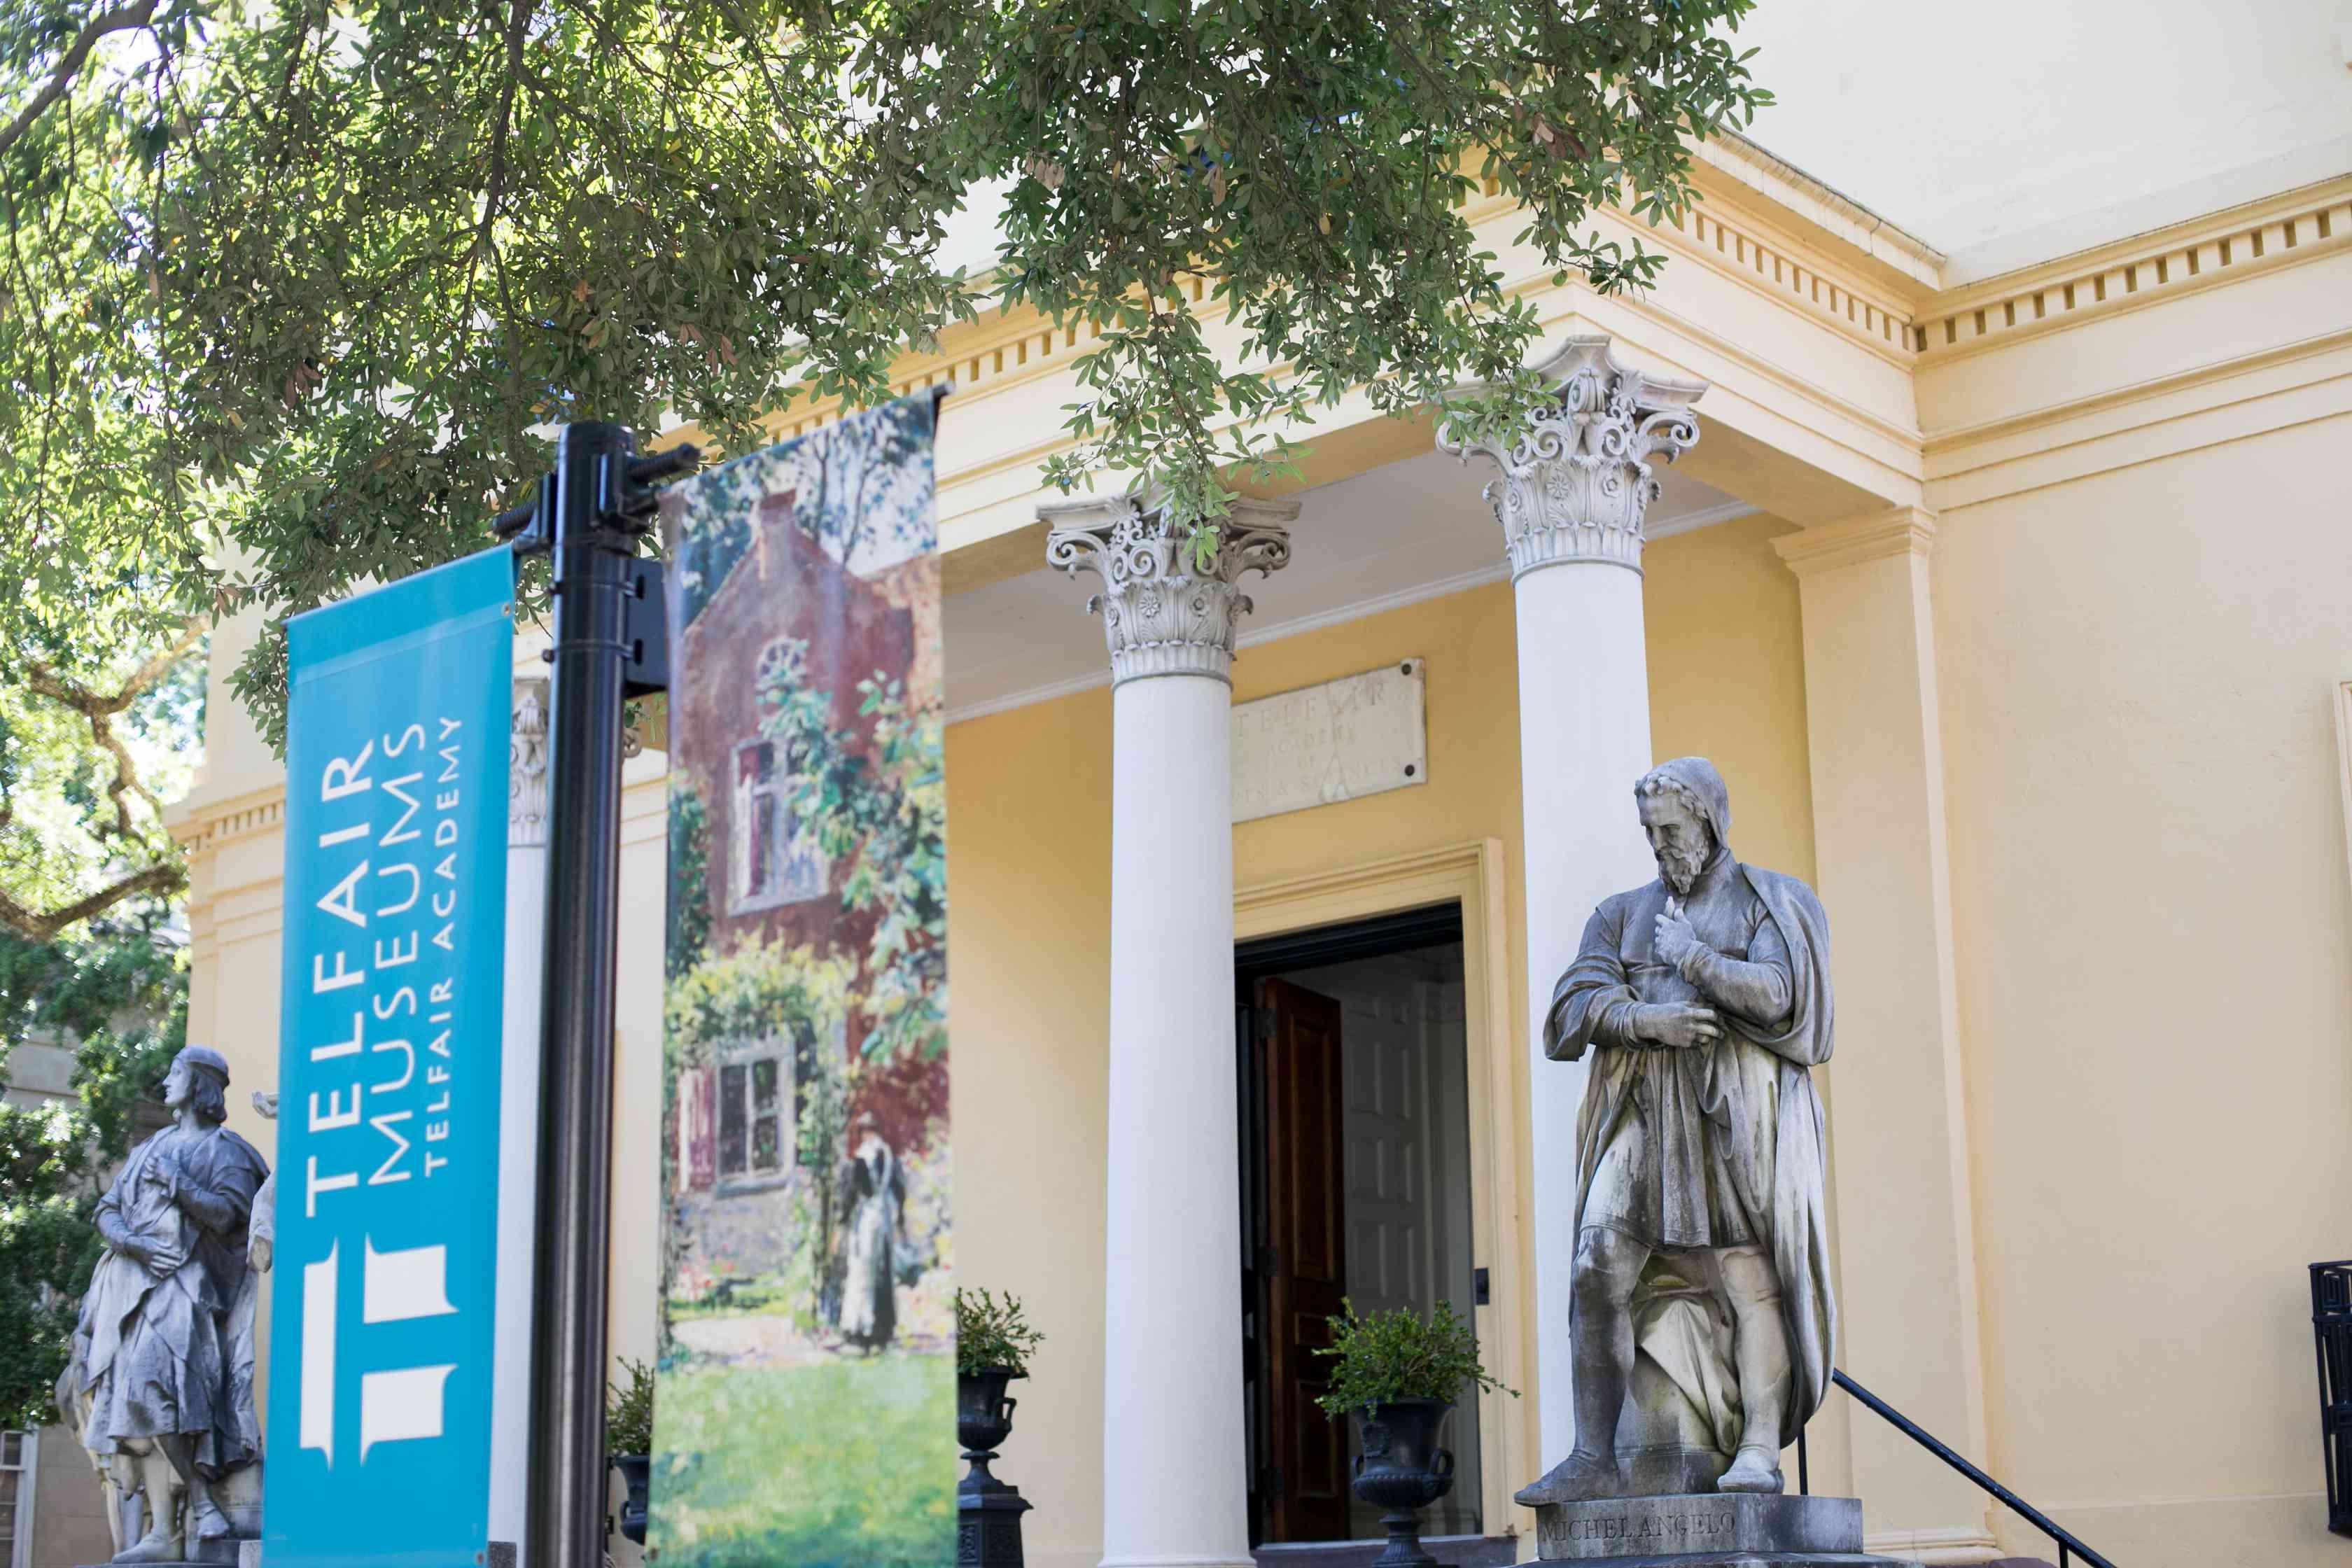 Telfair Museum of Art in Savannah, GA